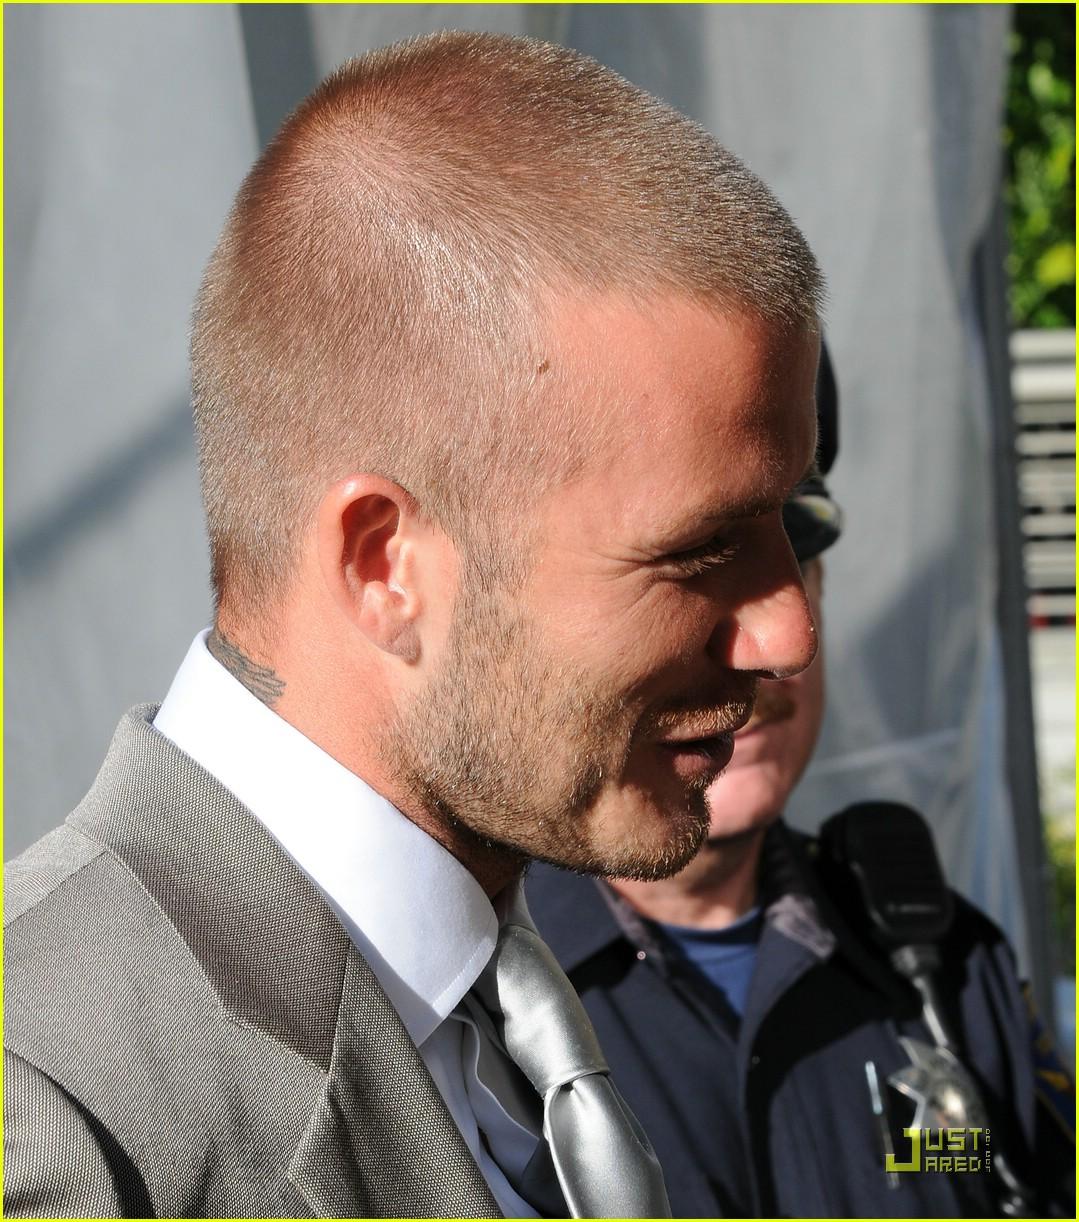 David Beckham Gets Tight With Emporio Armani Photo - David beckham armani hairstyle